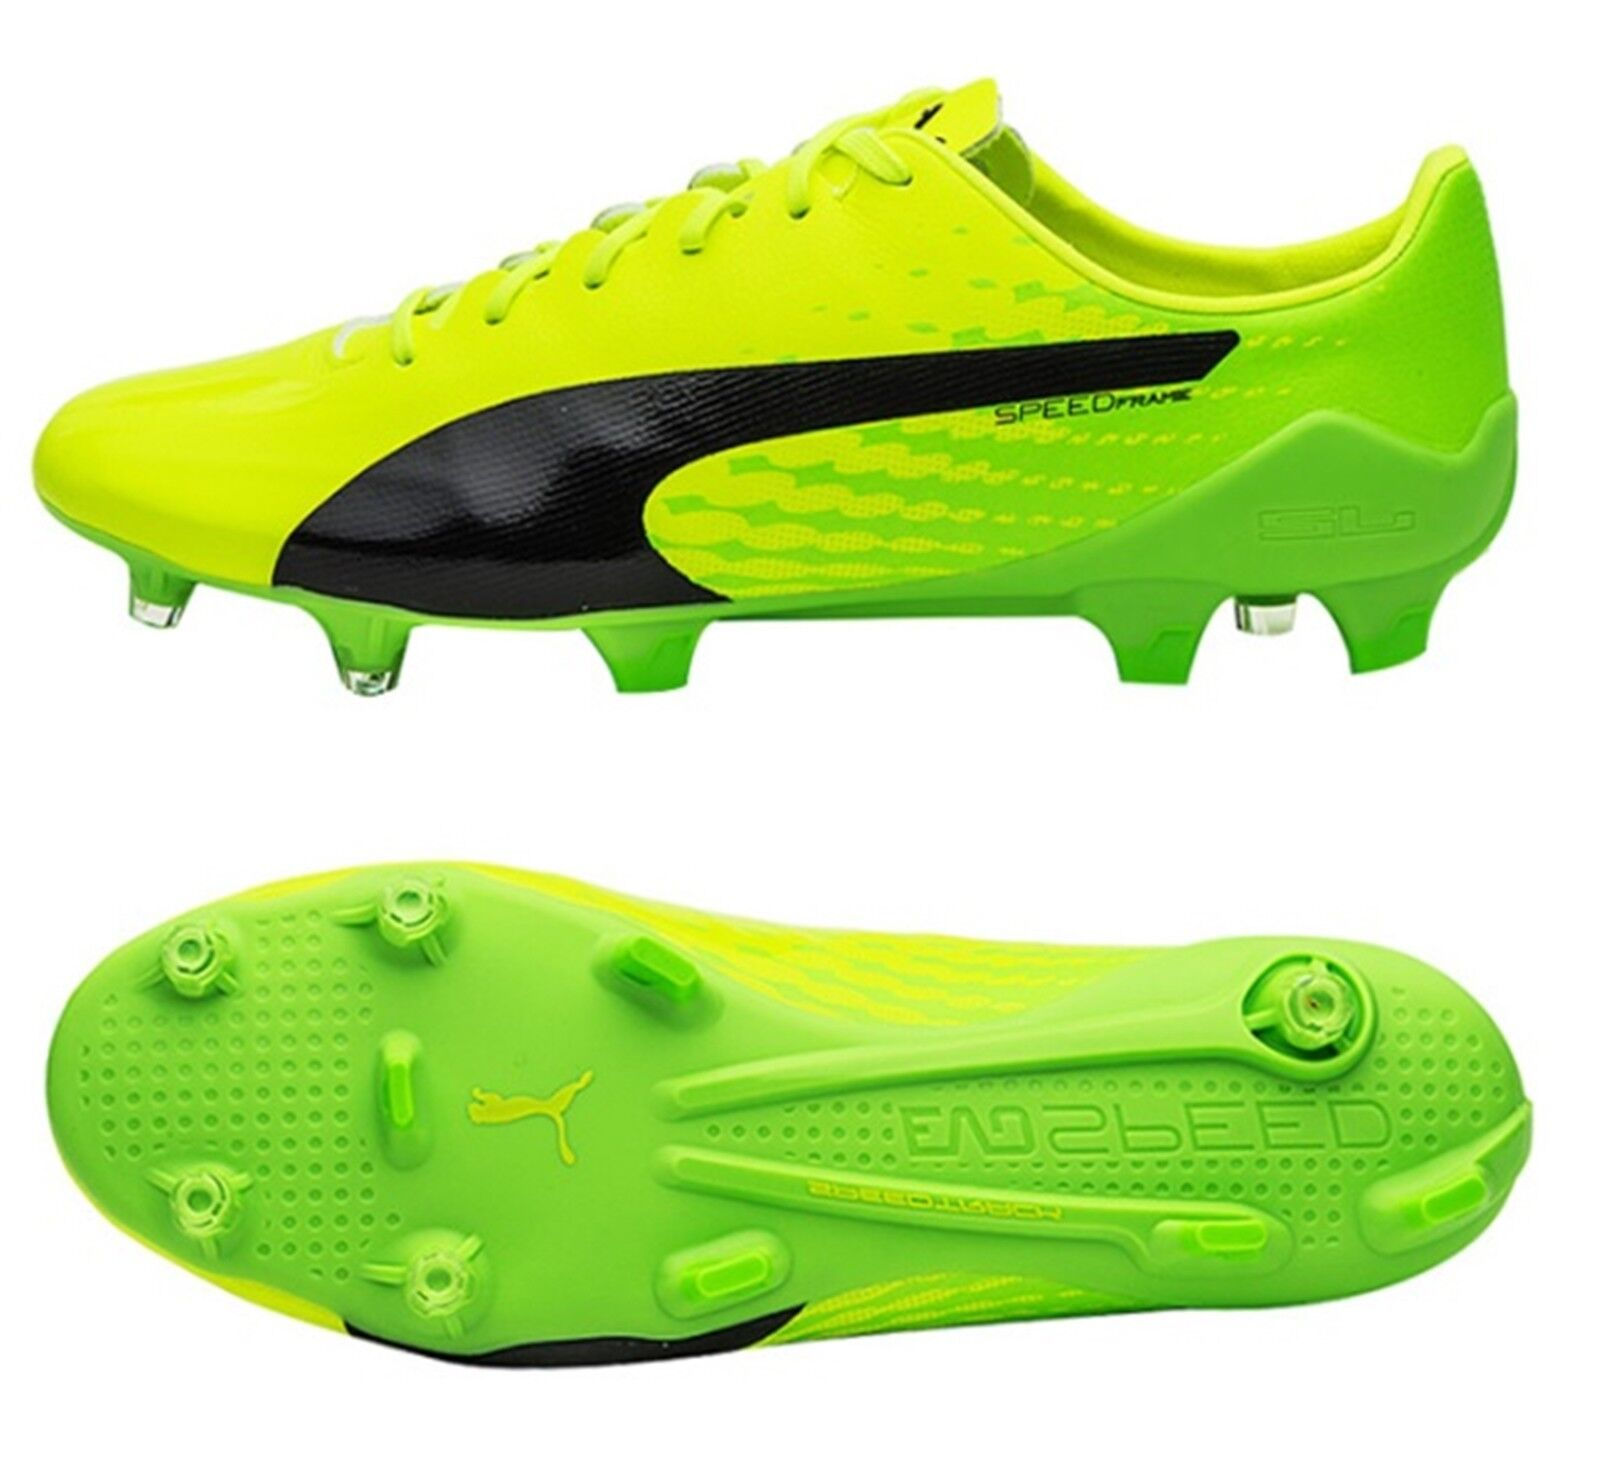 PUMA Men evoSPEED 17 SL S FG Cleats Soccer Grün Soccer Cleats Football Schuhes Spike 104010-01 f0fc93